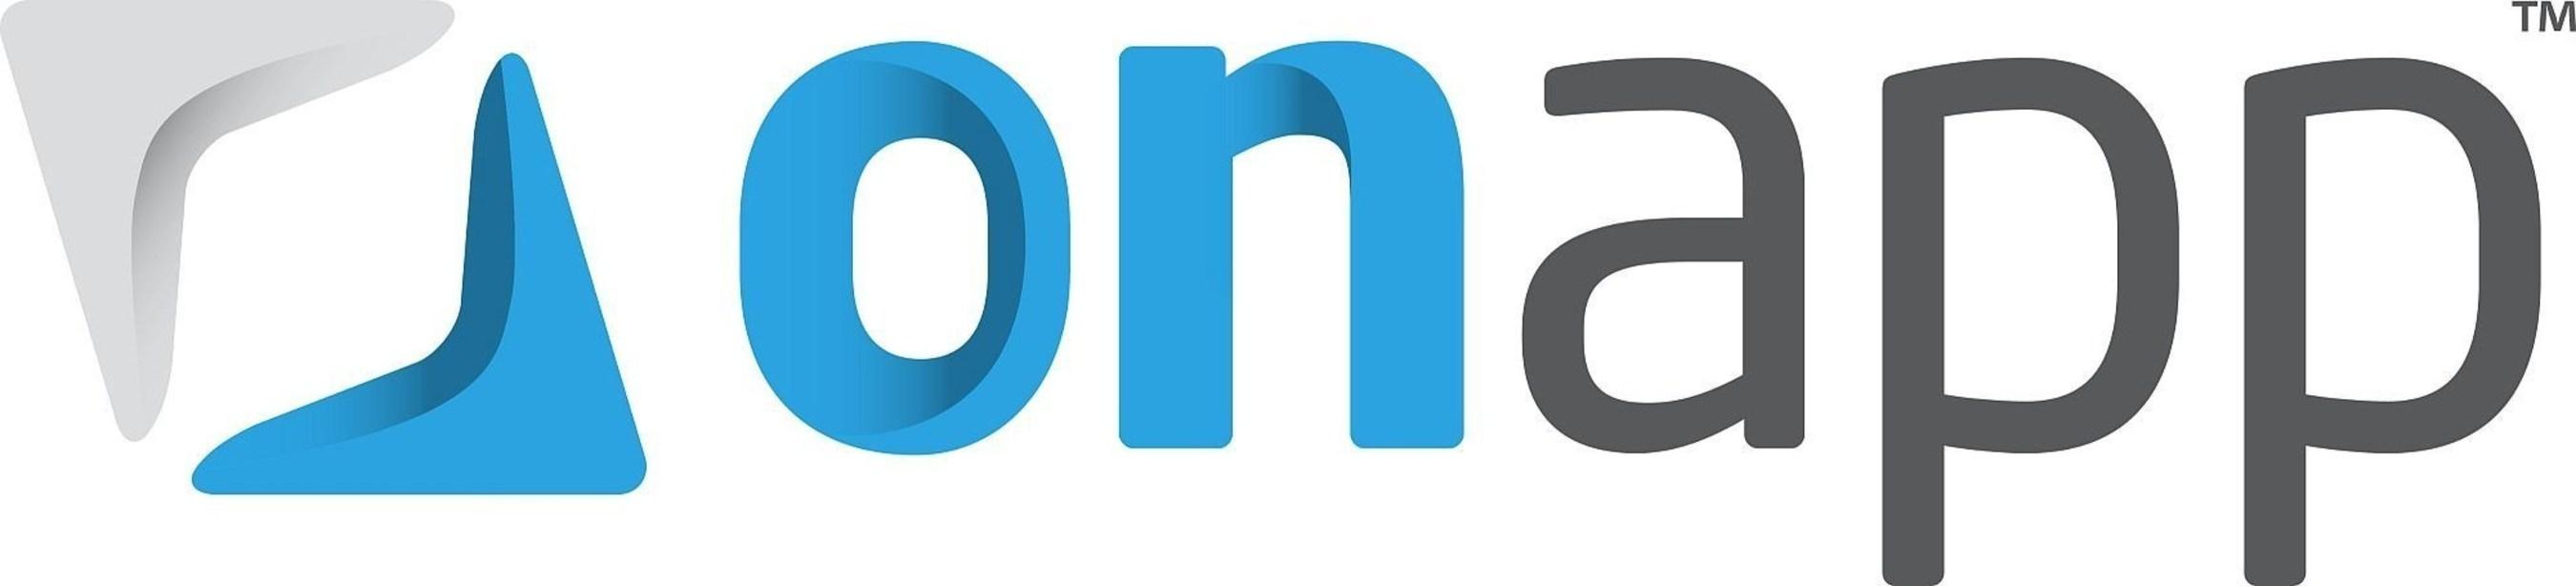 Cloud Carib Deploys OnApp's VMware Portal to Cut Customer Onboarding Time by 50%